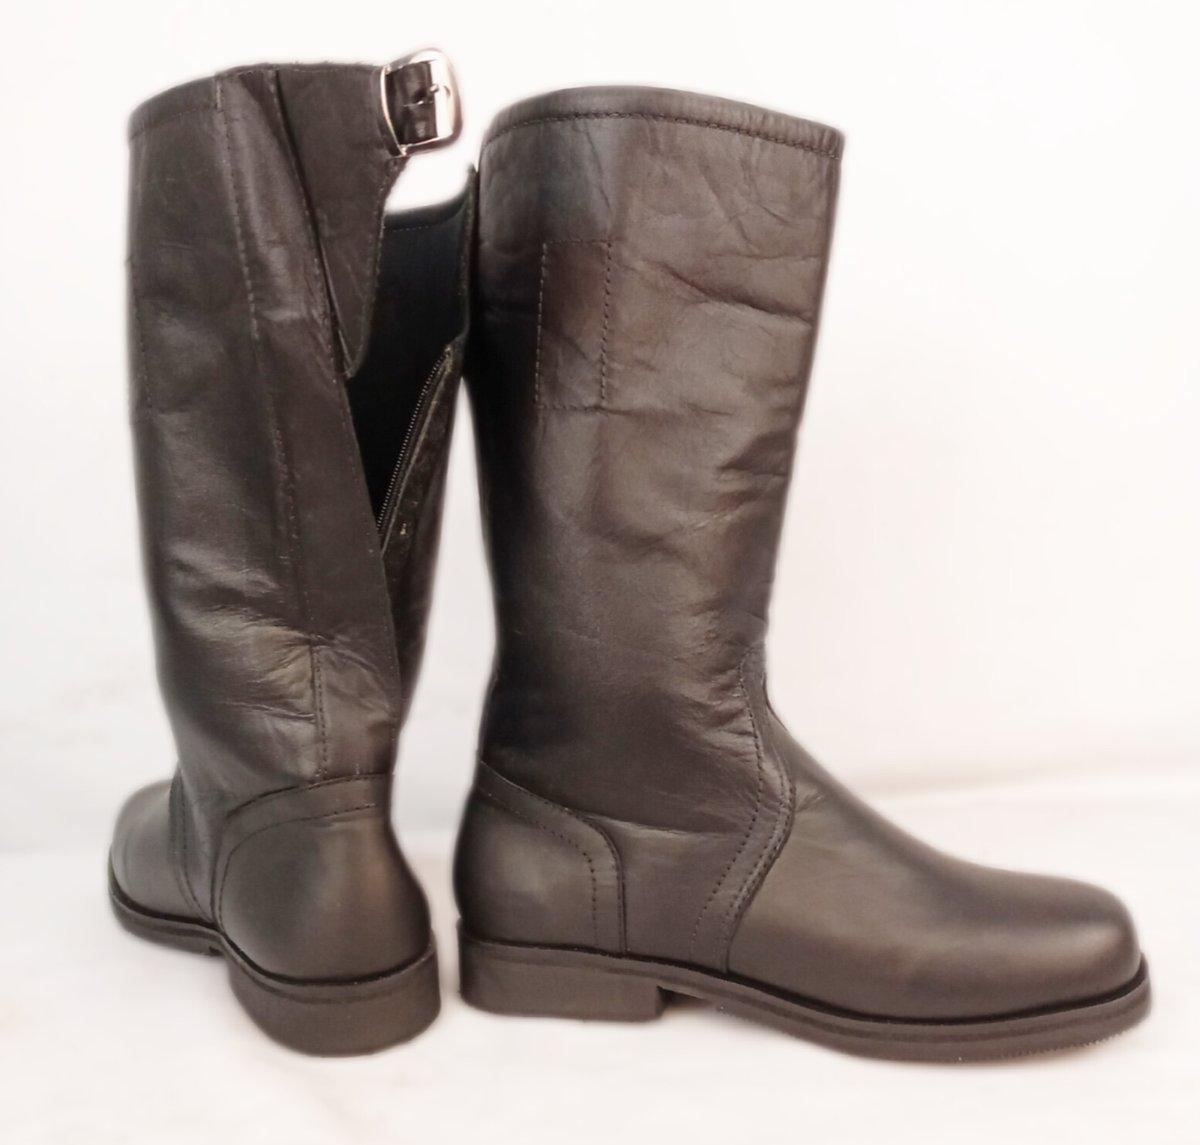 Image of #24 - B Grade from Stock - Shoe Size EU 41